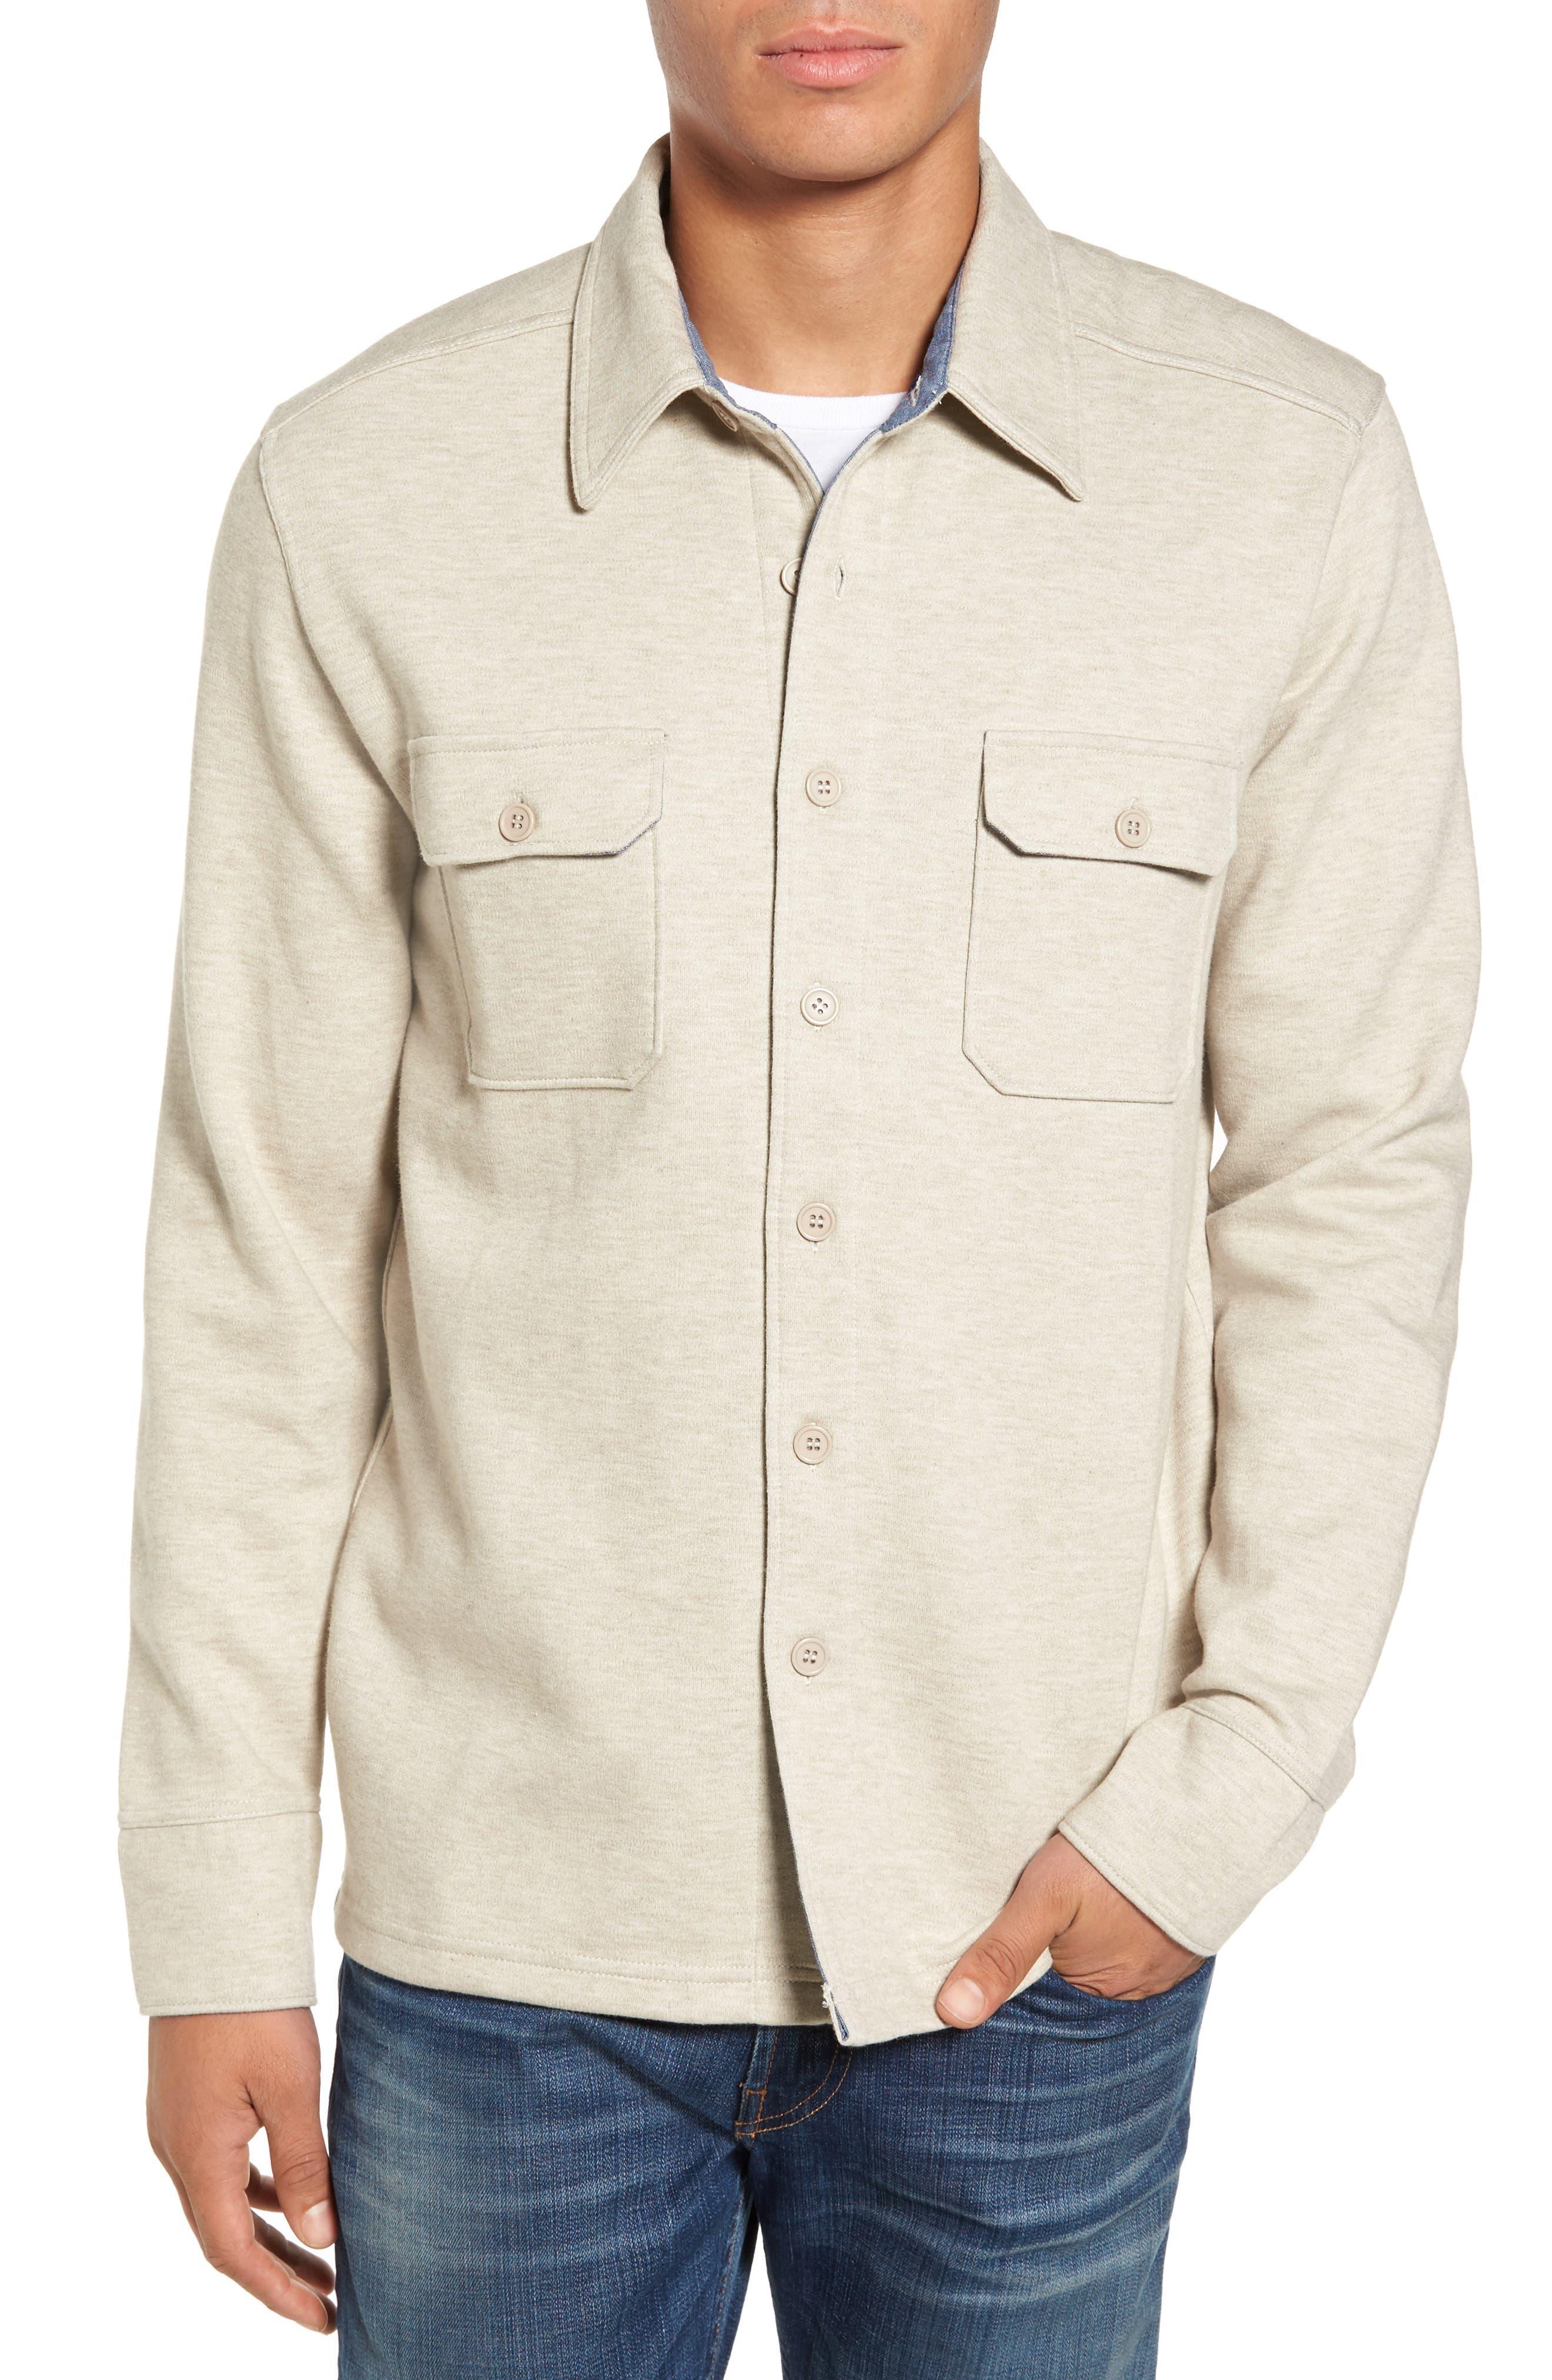 Cova 'Longitude' Flap Pocket Fleece Shirt